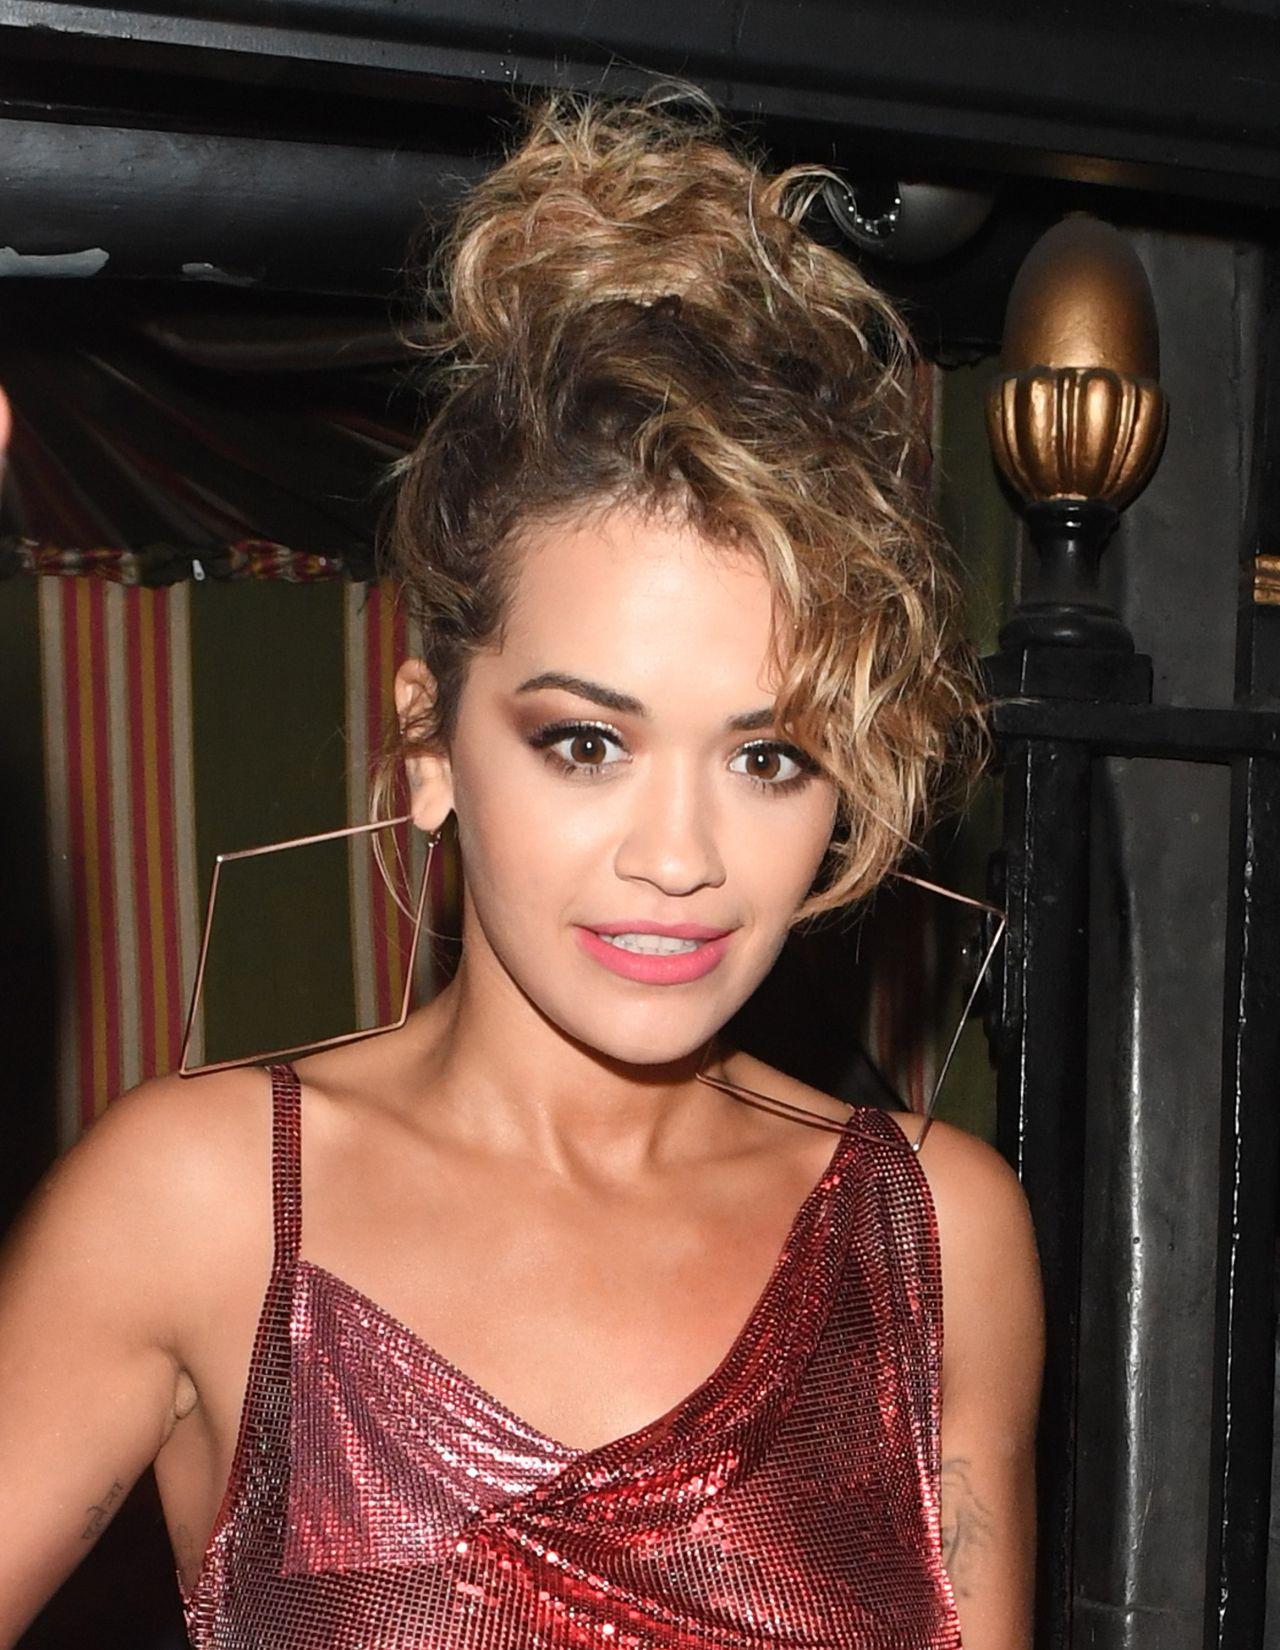 Rita Ora Fashion Shoot Photos: Rita Ora Arriving For The Gig In Mayfair, London 06/27/2017